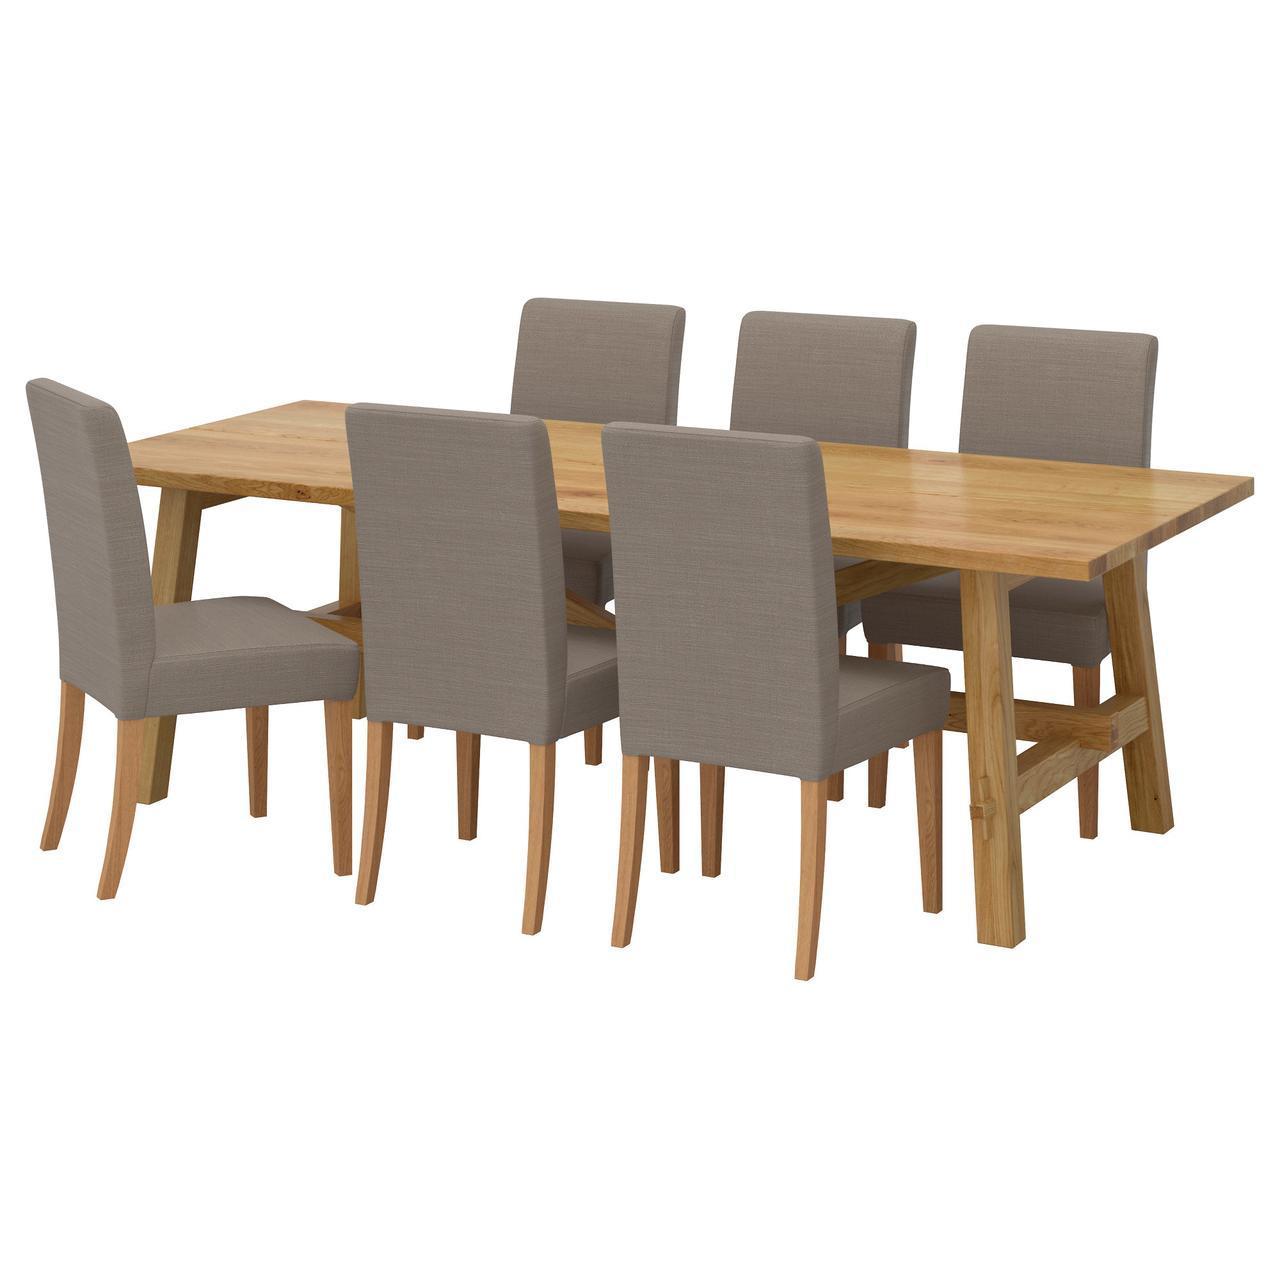 IKEA MOCKELBY / HENRIKSDAL (991.614.90) Стол и 6 стульев, даб, Нобхага серо-коричневый